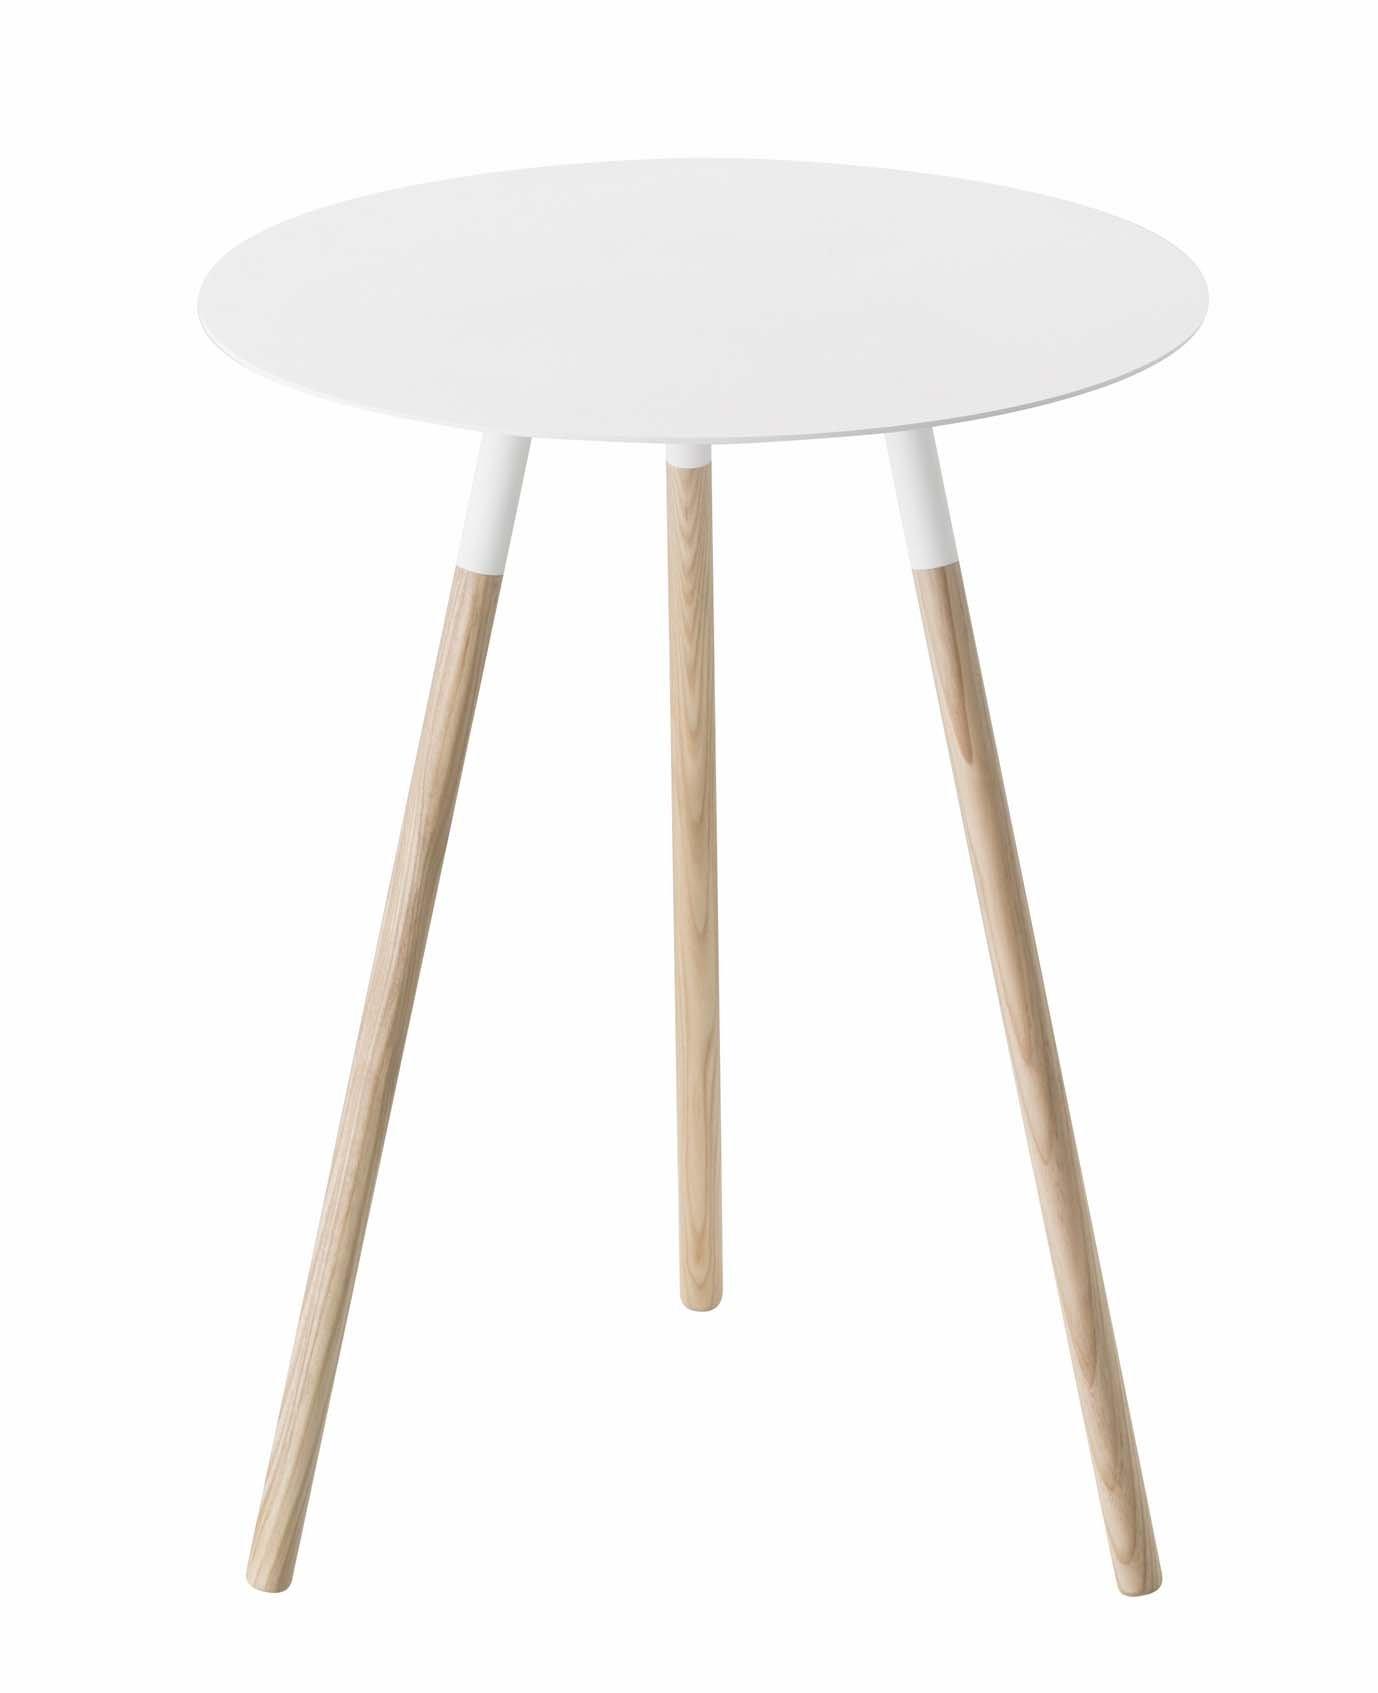 YAMAZAKI home Plain Side Table, White